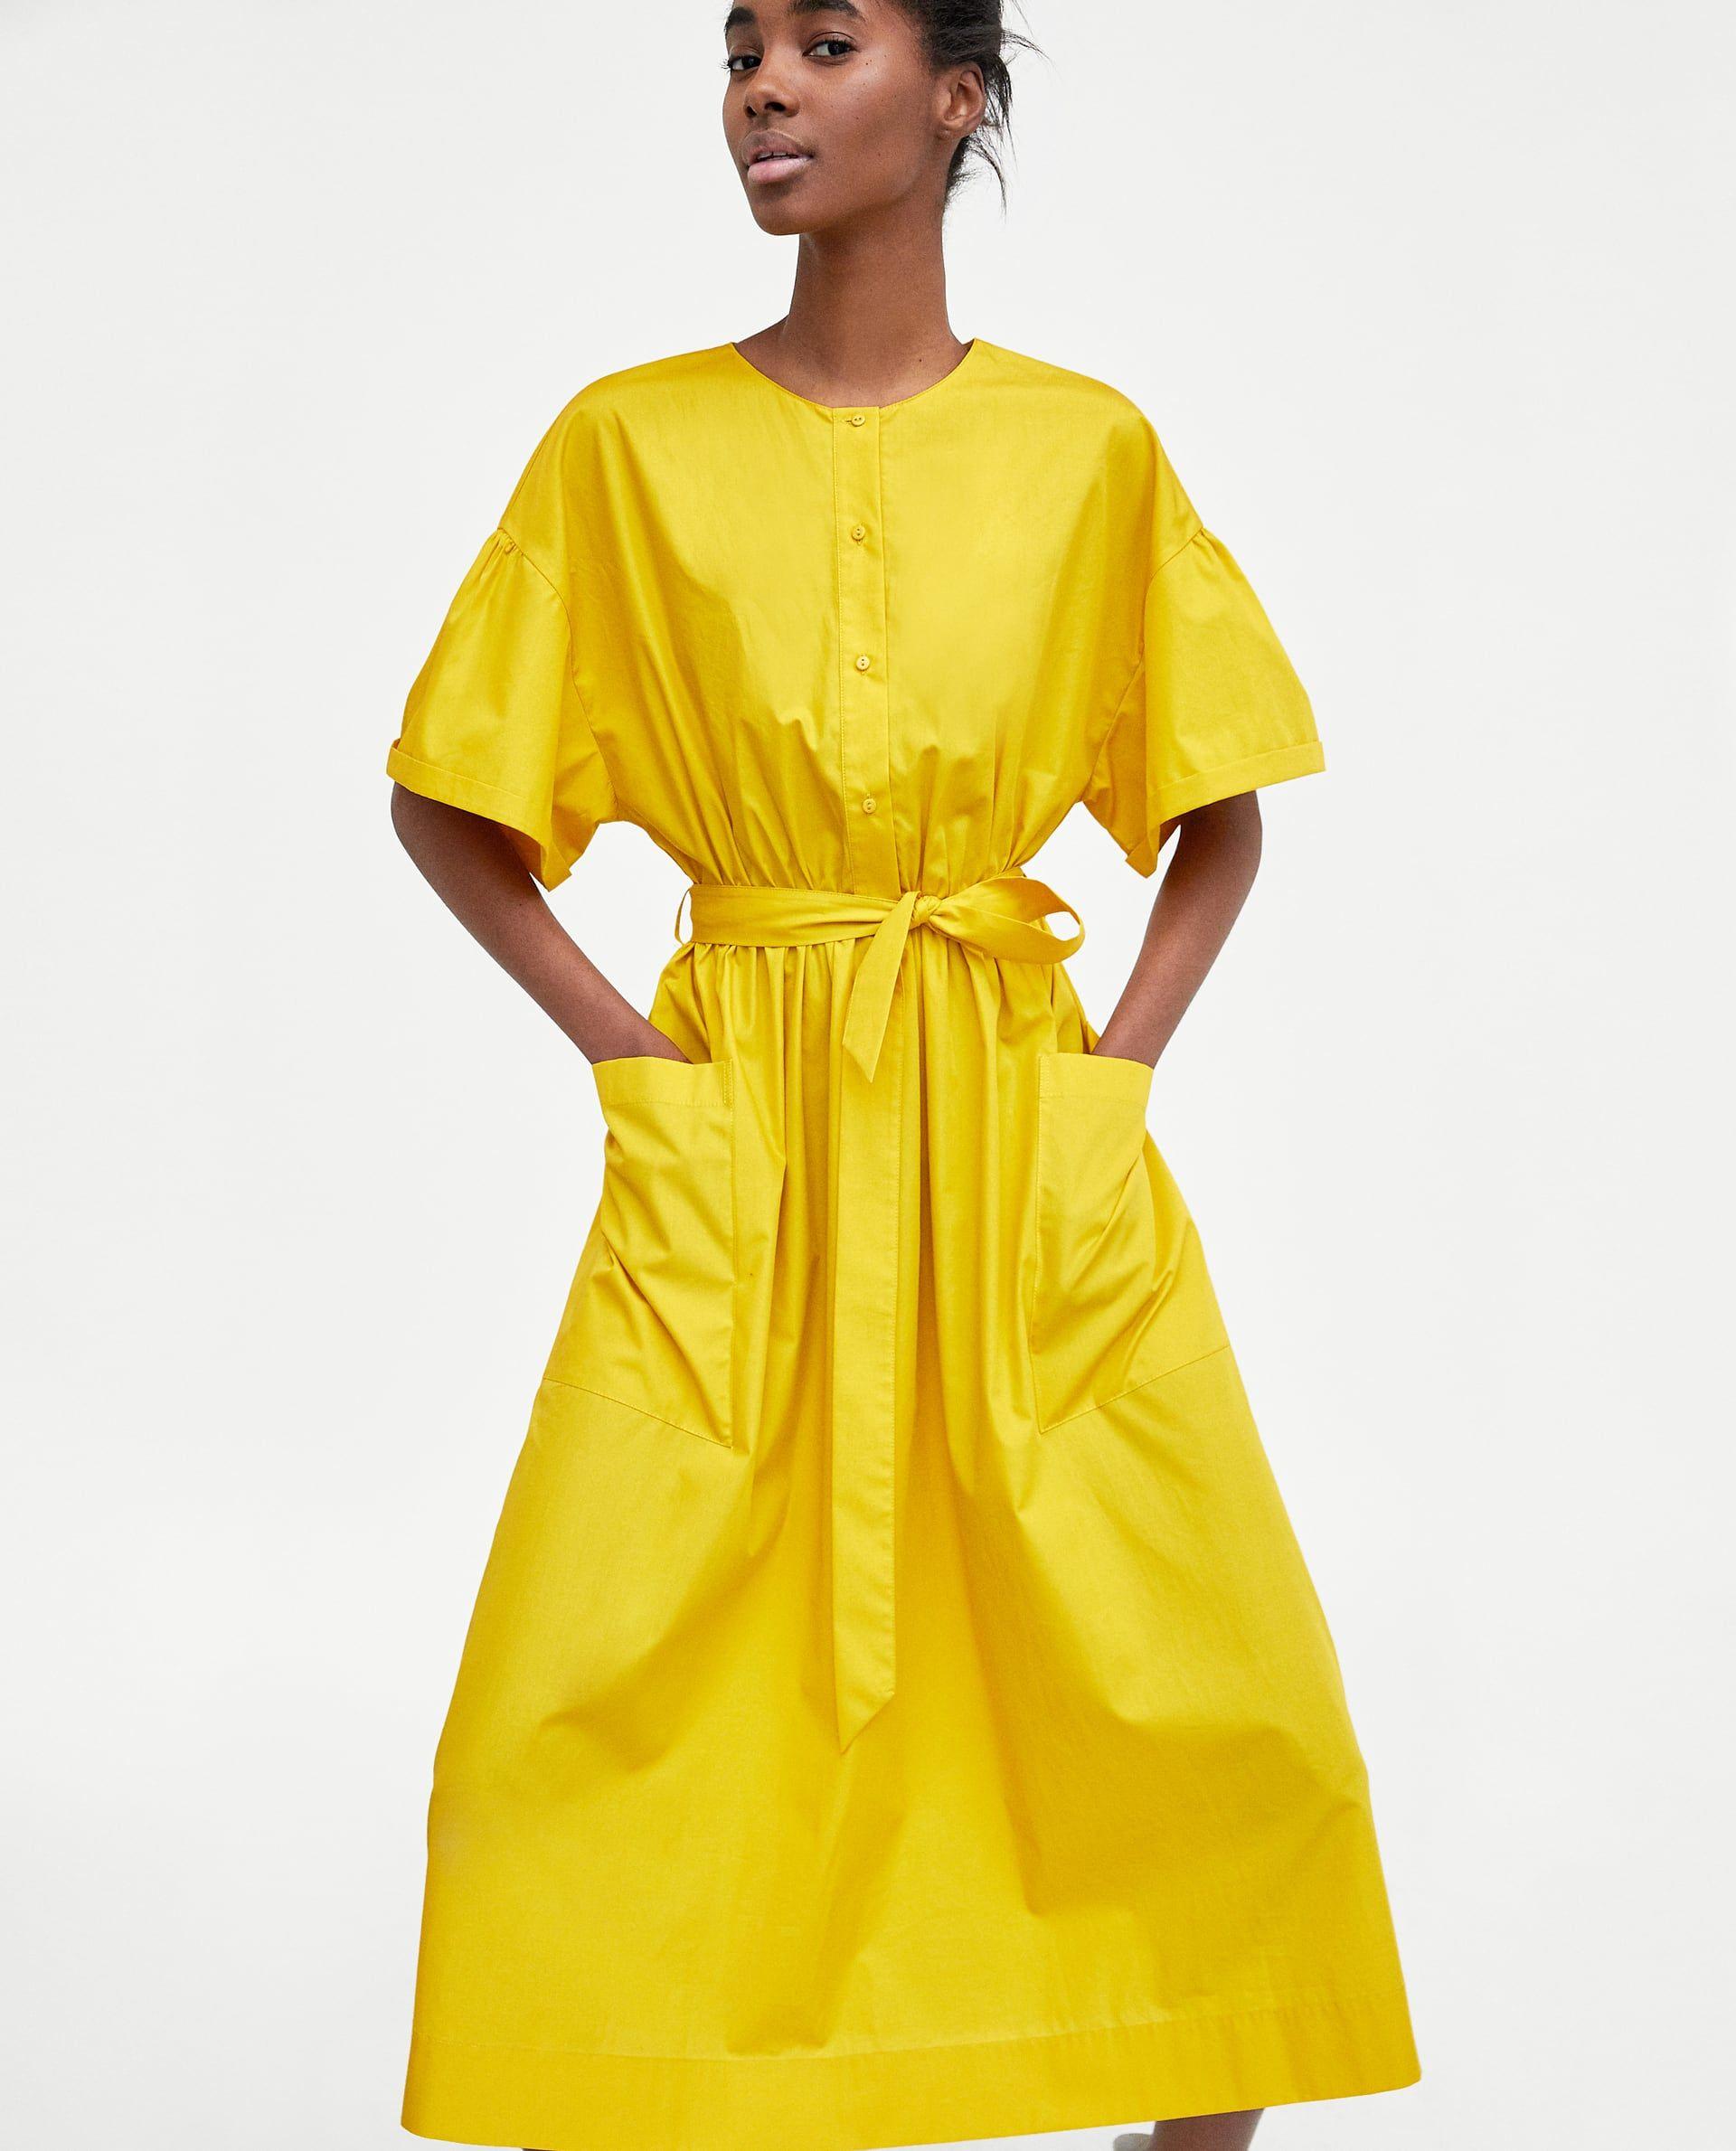 d65ac4942352 Women s Dresses